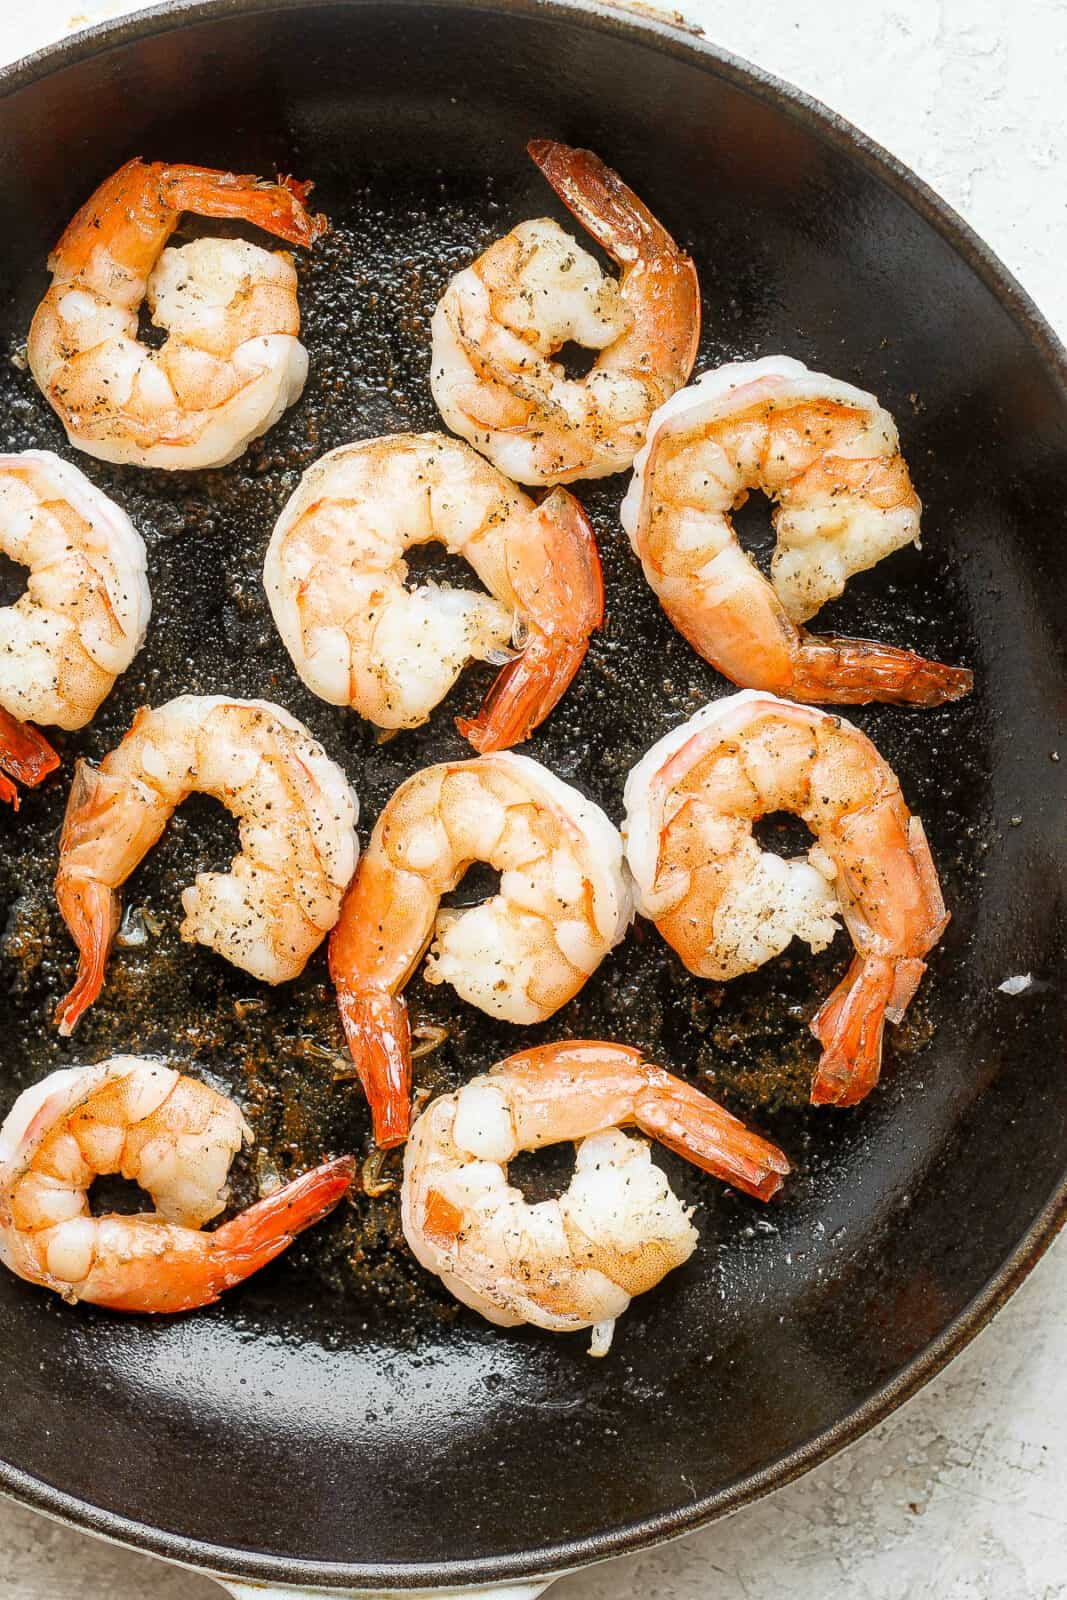 Pan fried shrimp in a cast iron pan.